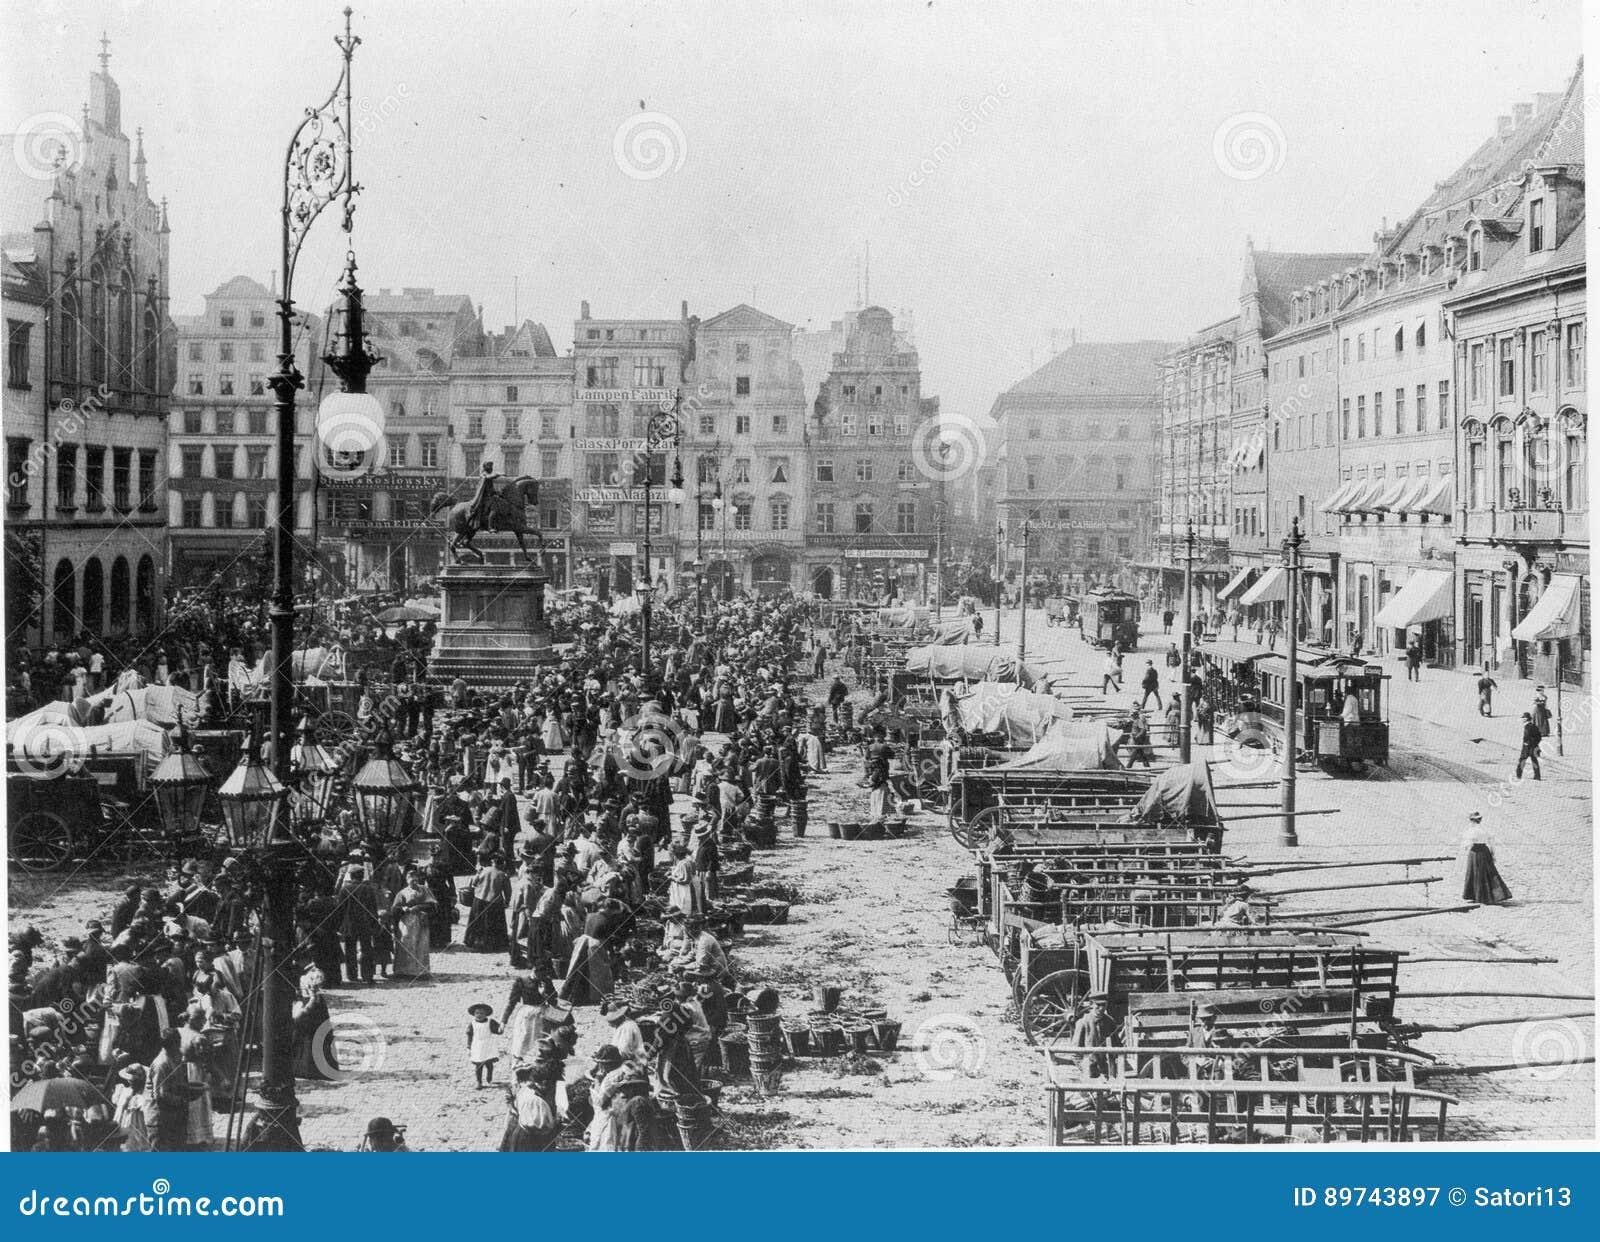 https://thumbs.dreamstime.com/z/facades-old-historic-tenements-rynek-market-square-wroclaw-breslau-poland-89743897.jpg